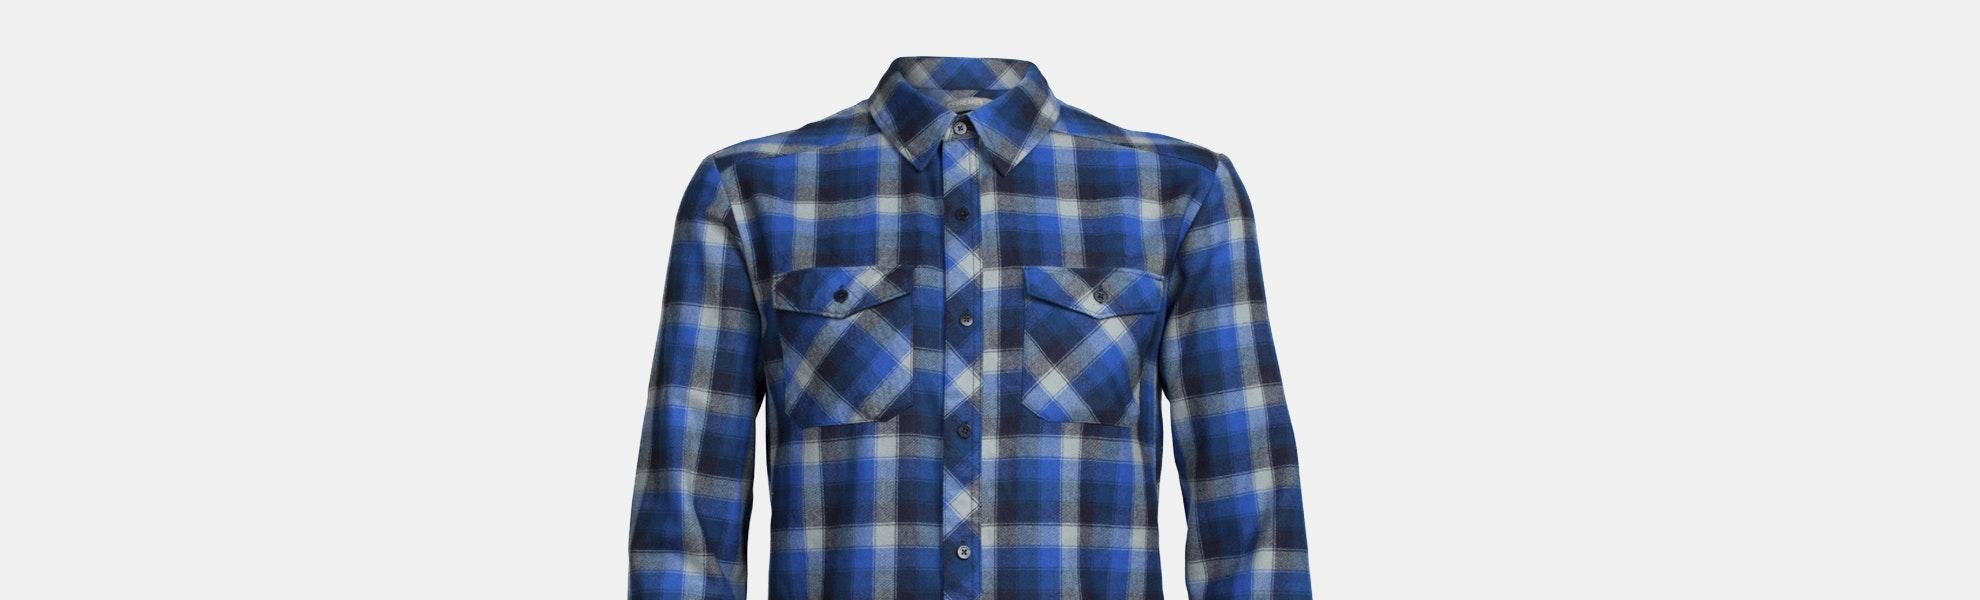 Icebreaker Men's Lodge Long Sleeve Plaid Shirt